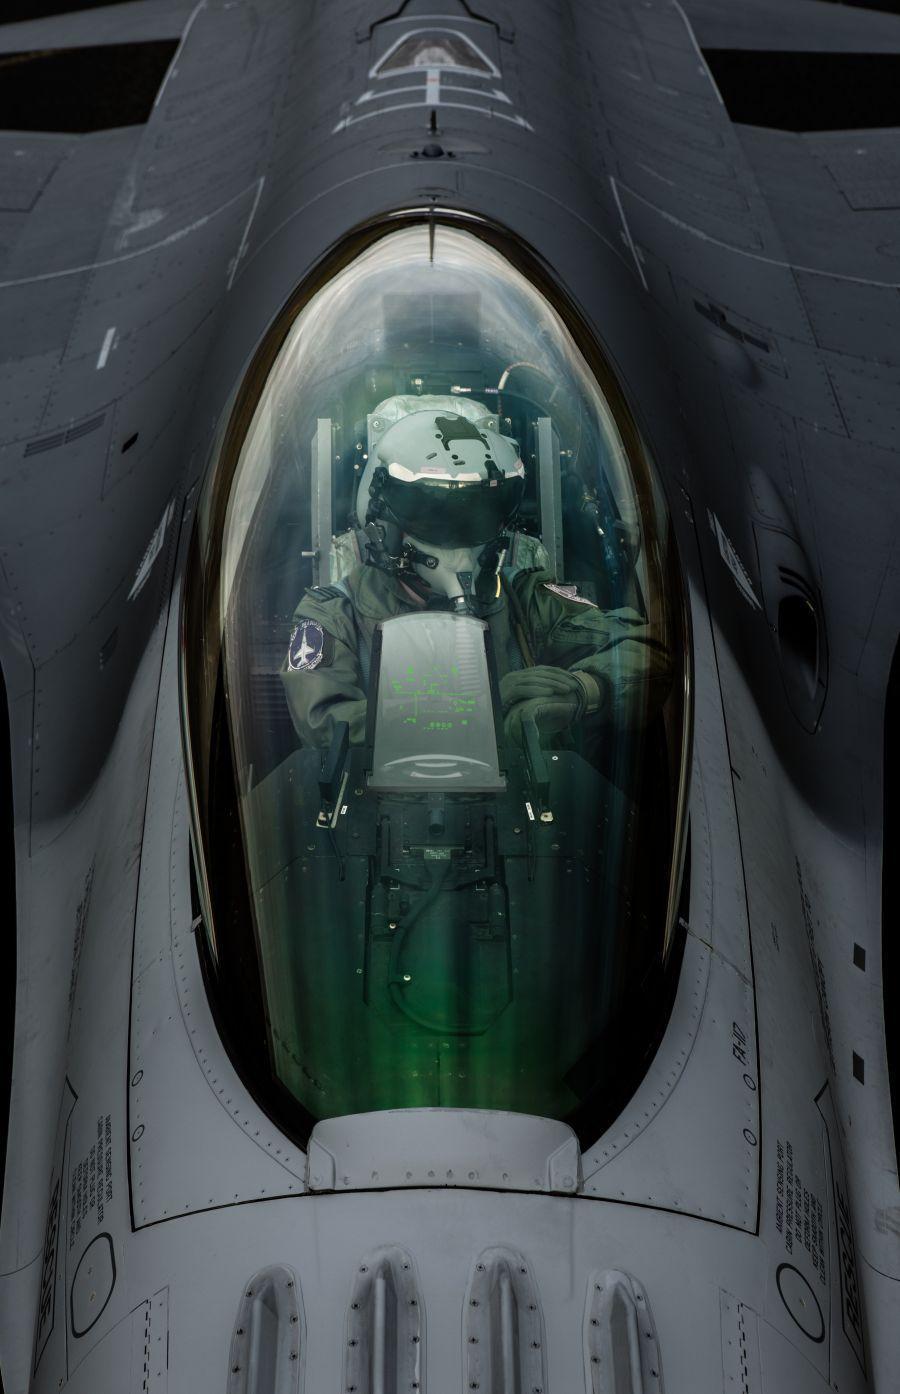 BELL & ROSS BR 03-92 HUD採用的抬頭顯示器主題,源自於戰鬥機。